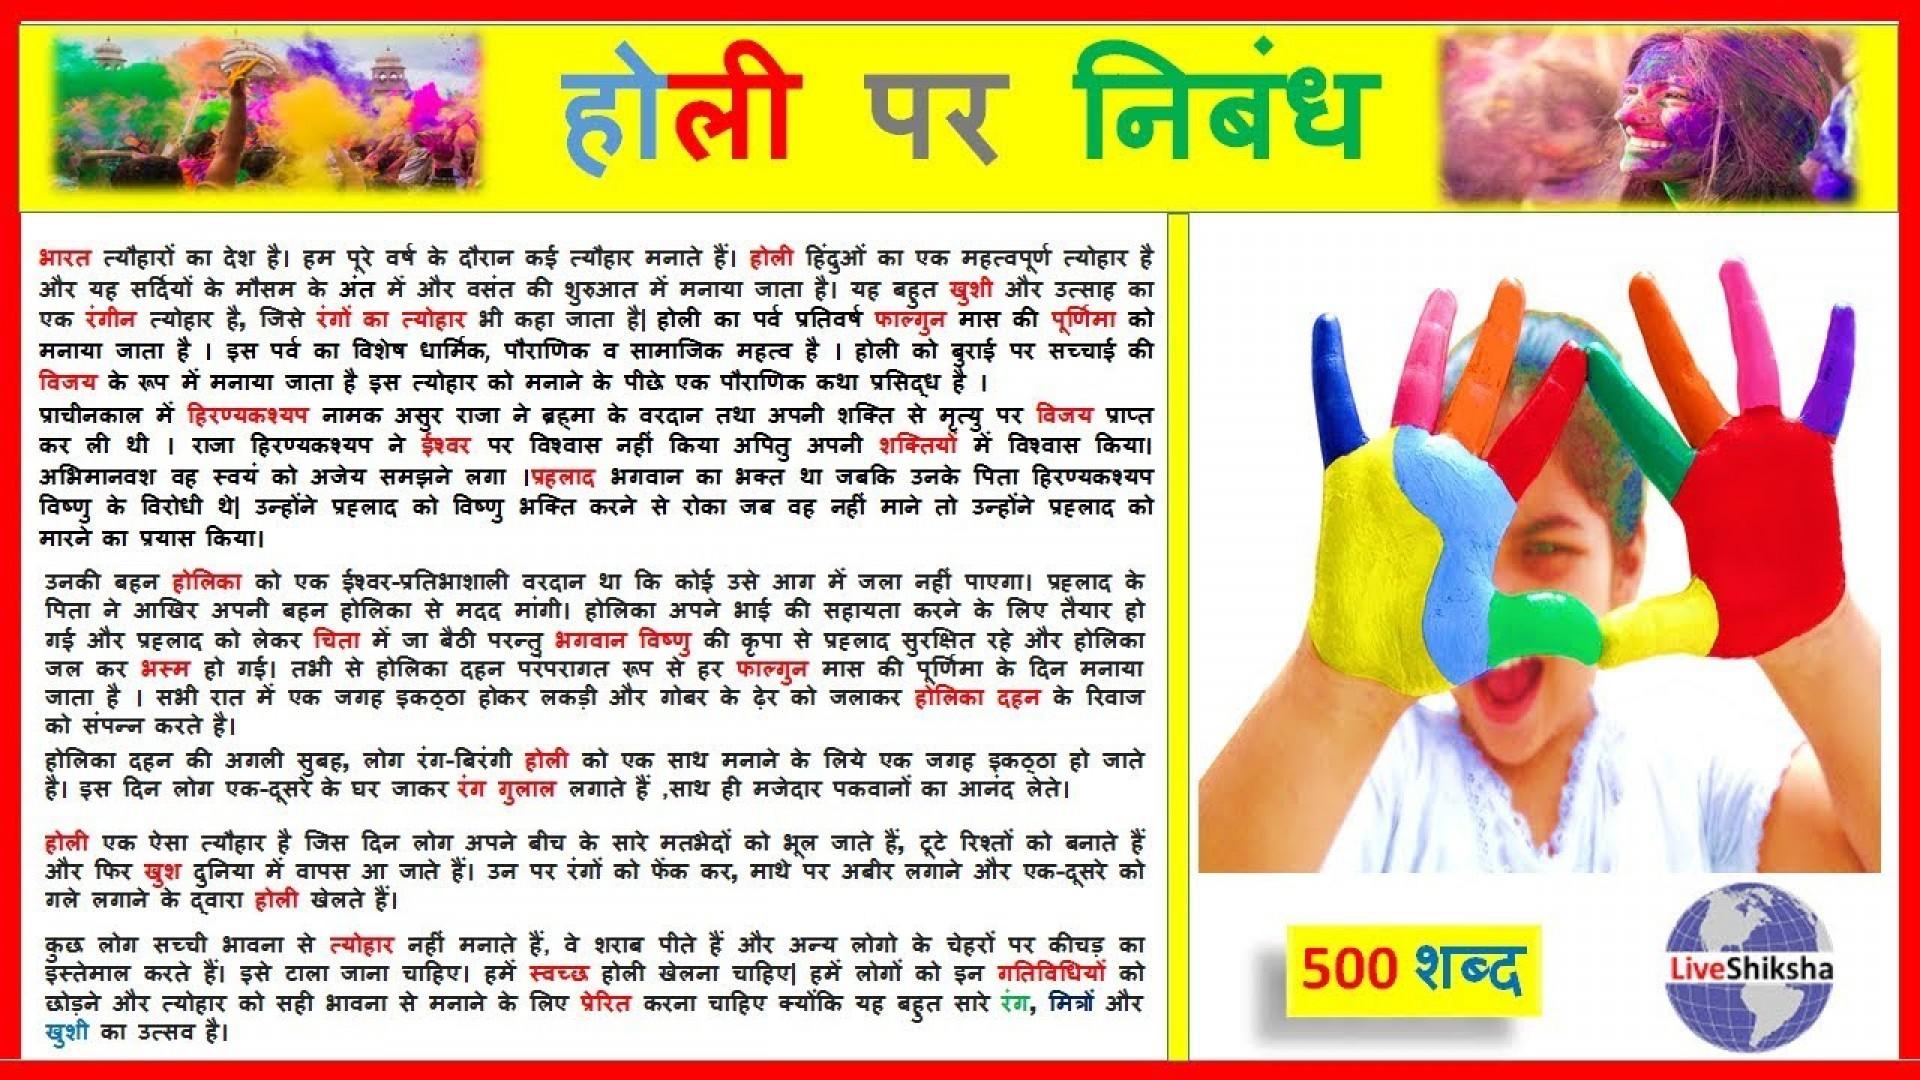 013 Essay On Holi Example Impressive Holidays Are Necessary Evils In Gujarati Festival Punjabi Language 1920